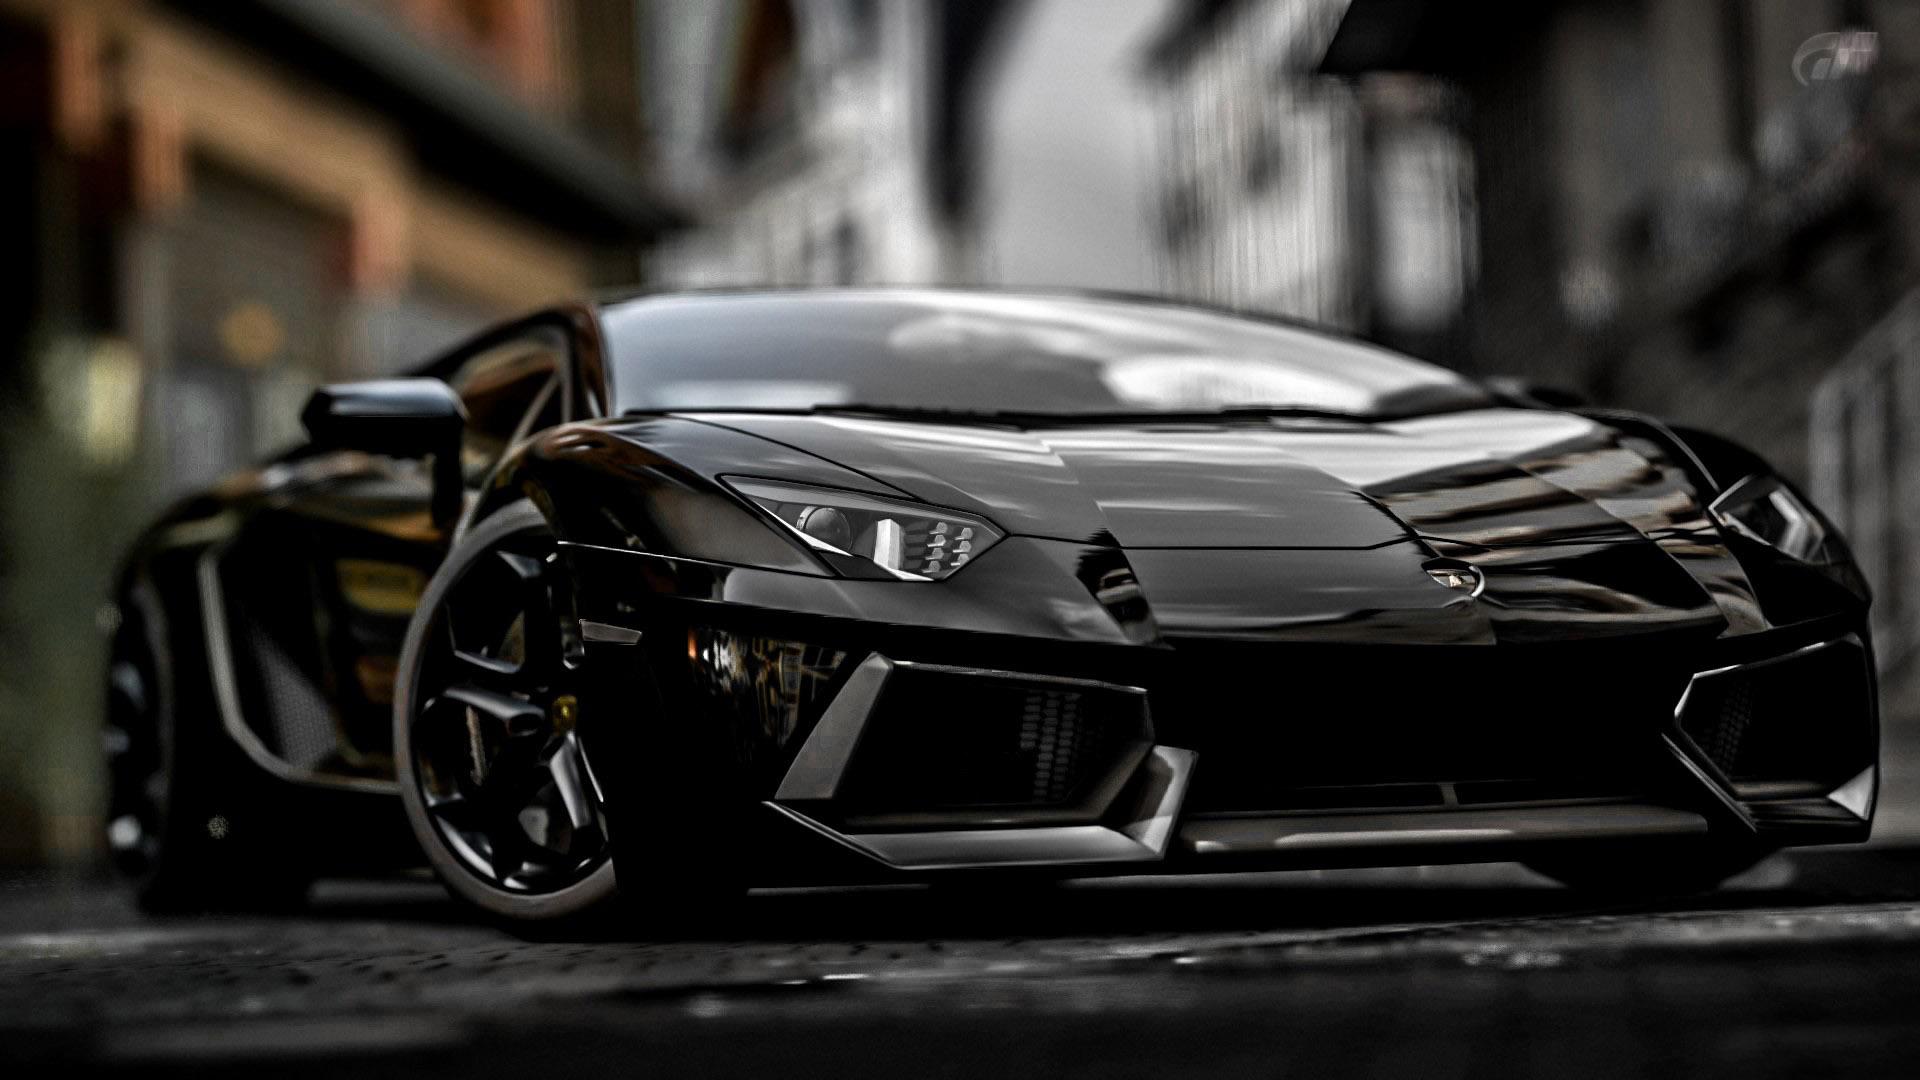 Black Lamborghini Aventador 28426